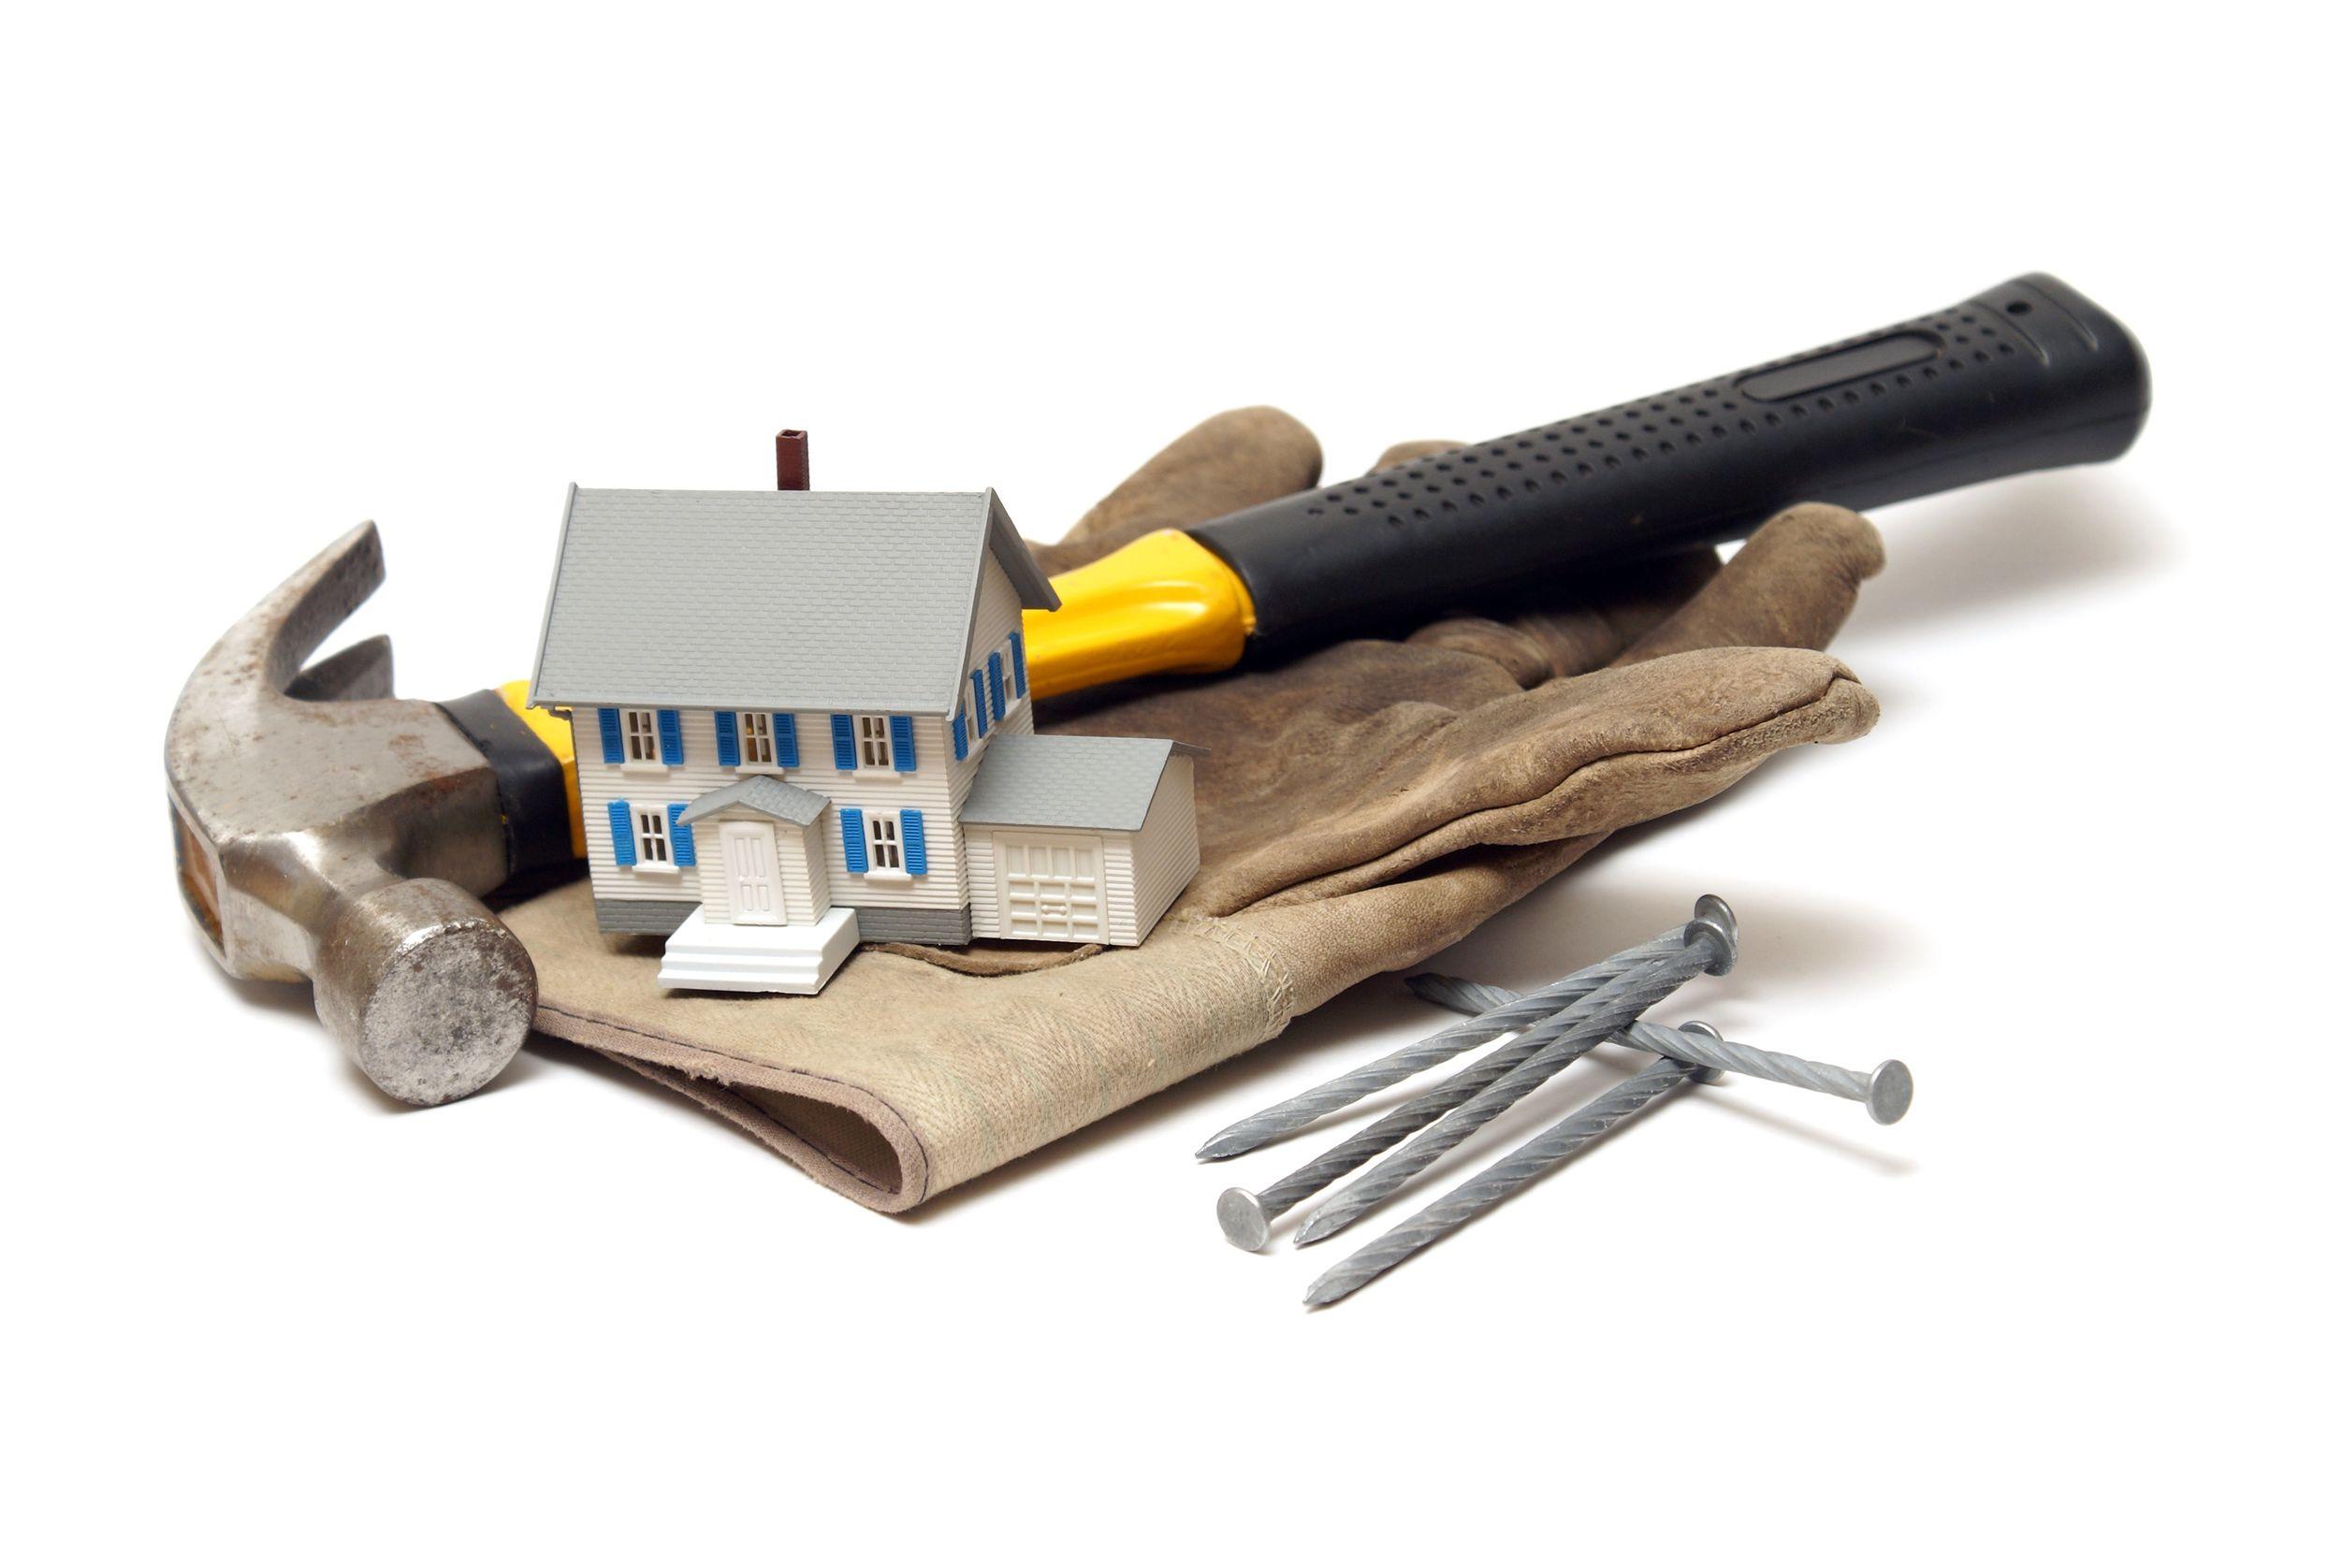 Construction Renovation: Property Flips and Insurance